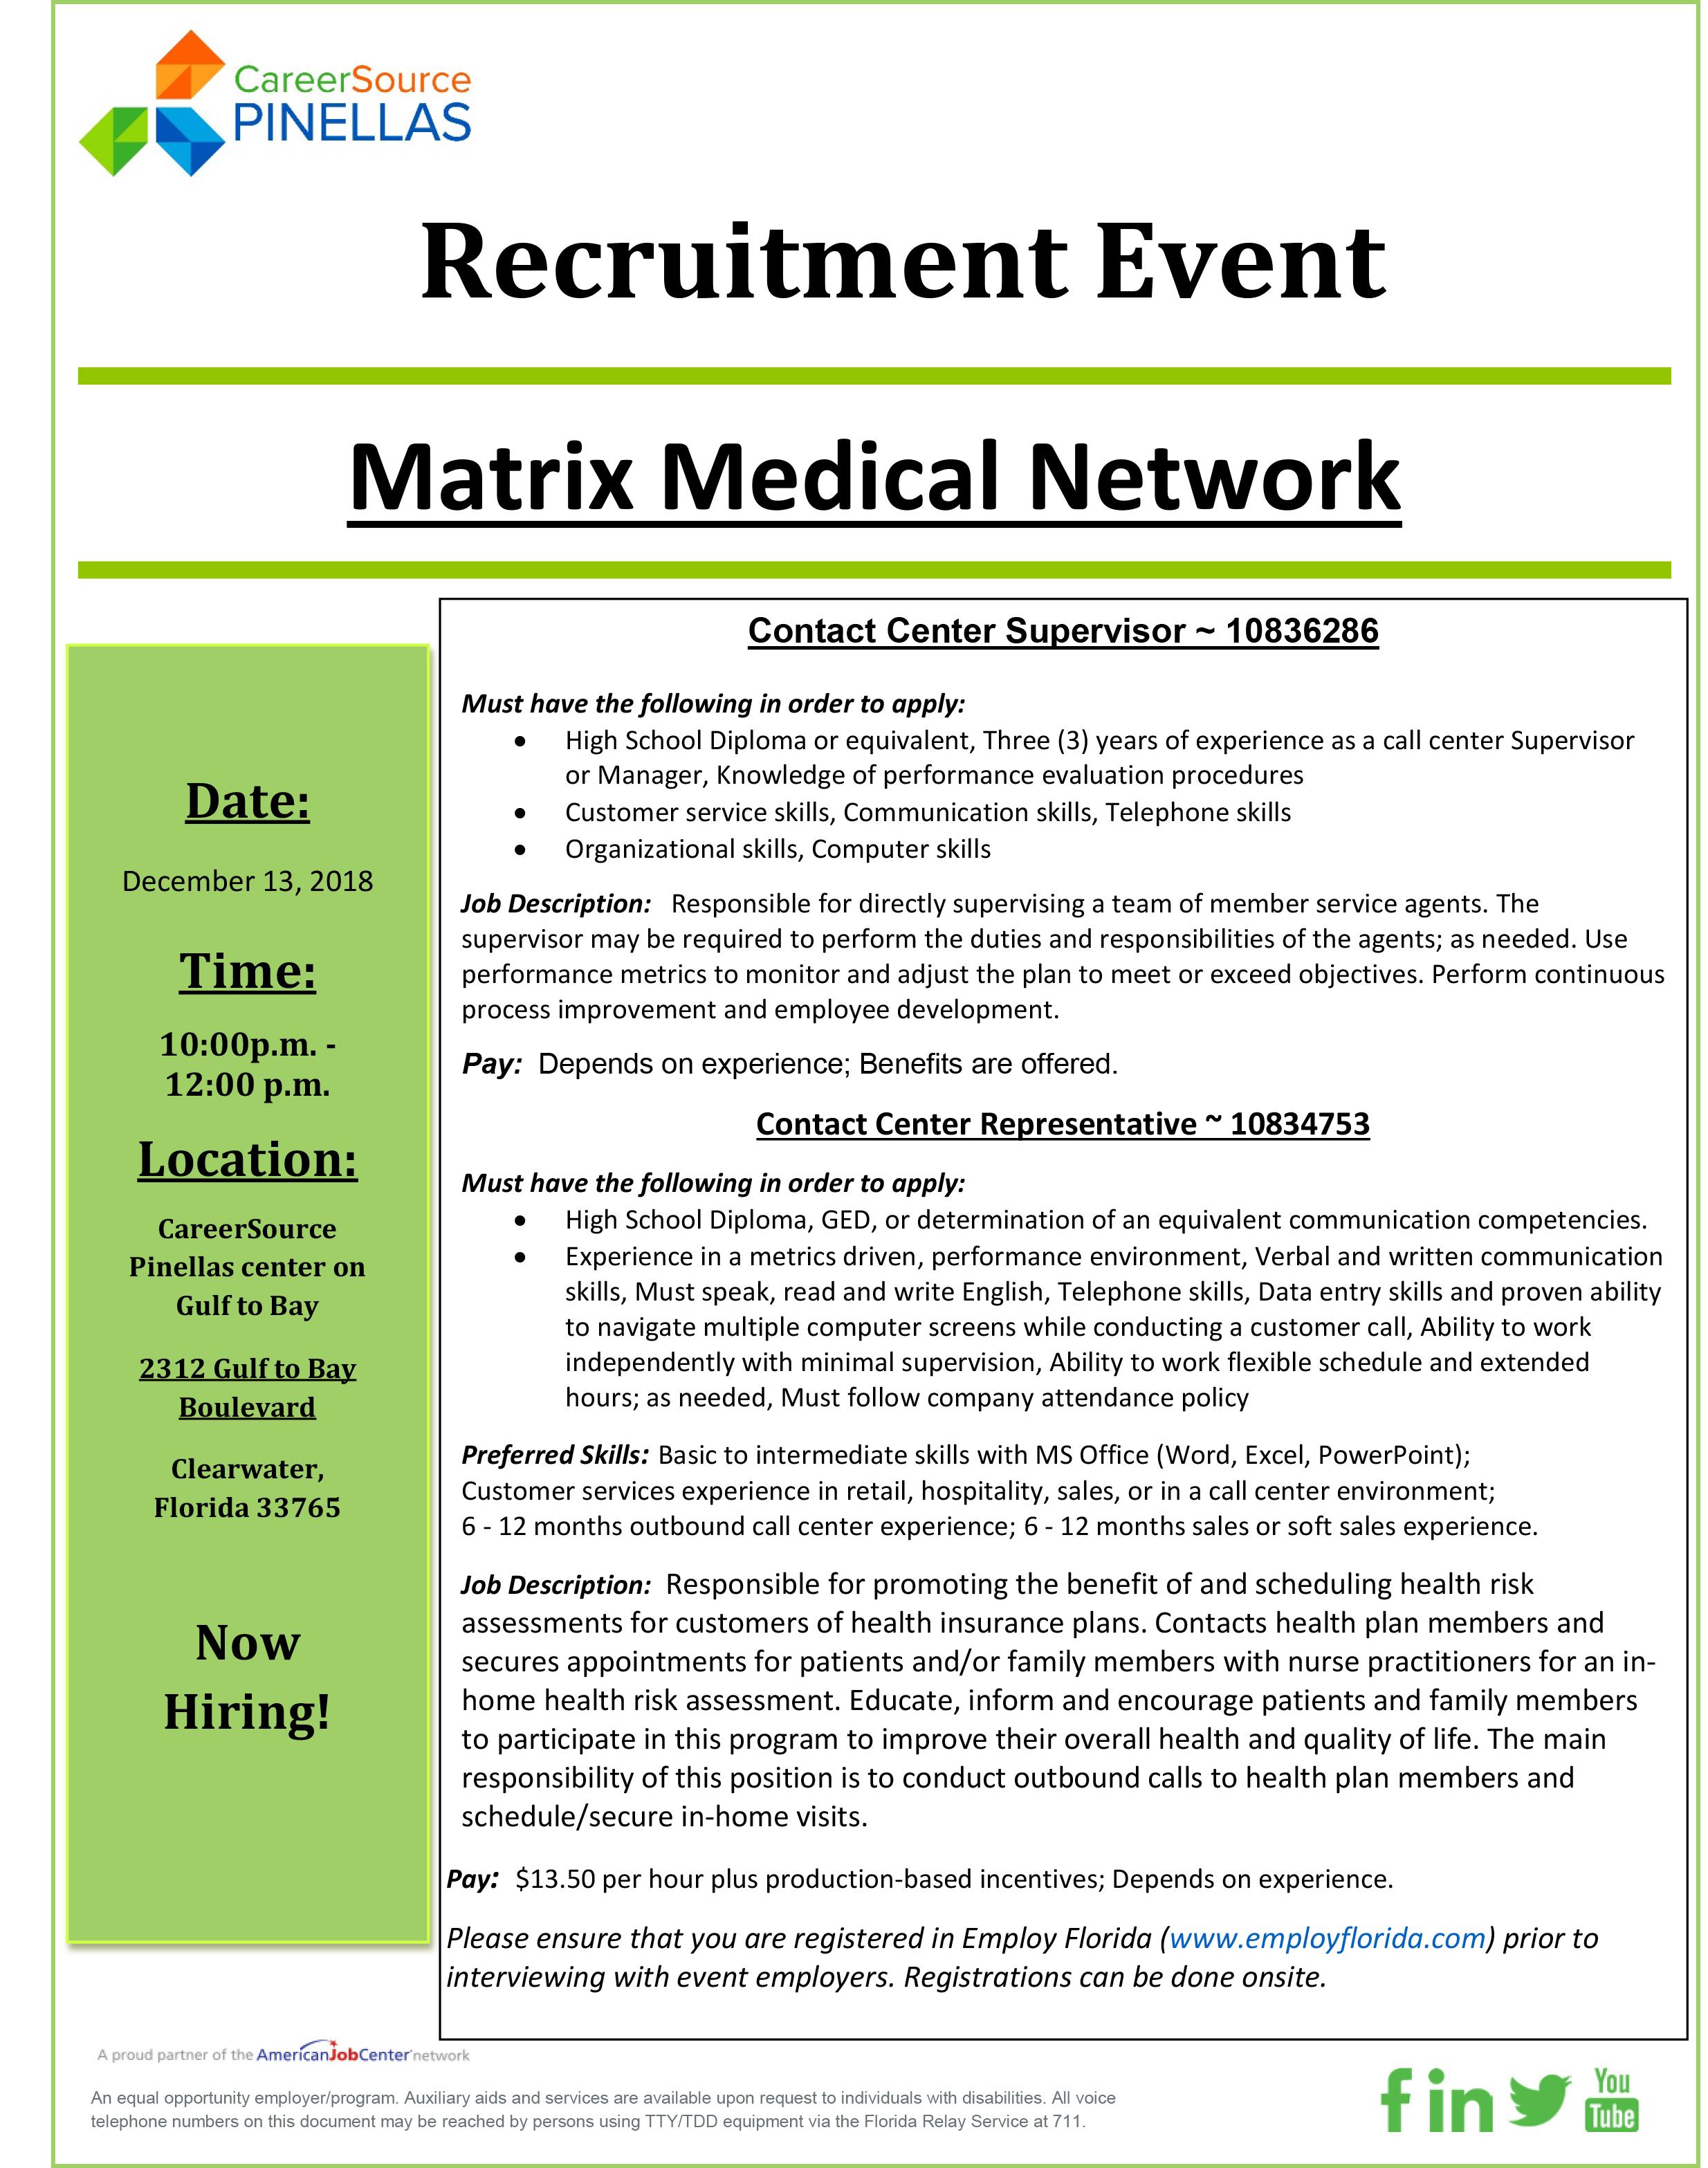 Matrix Medical Network 12-13-2018.jpg